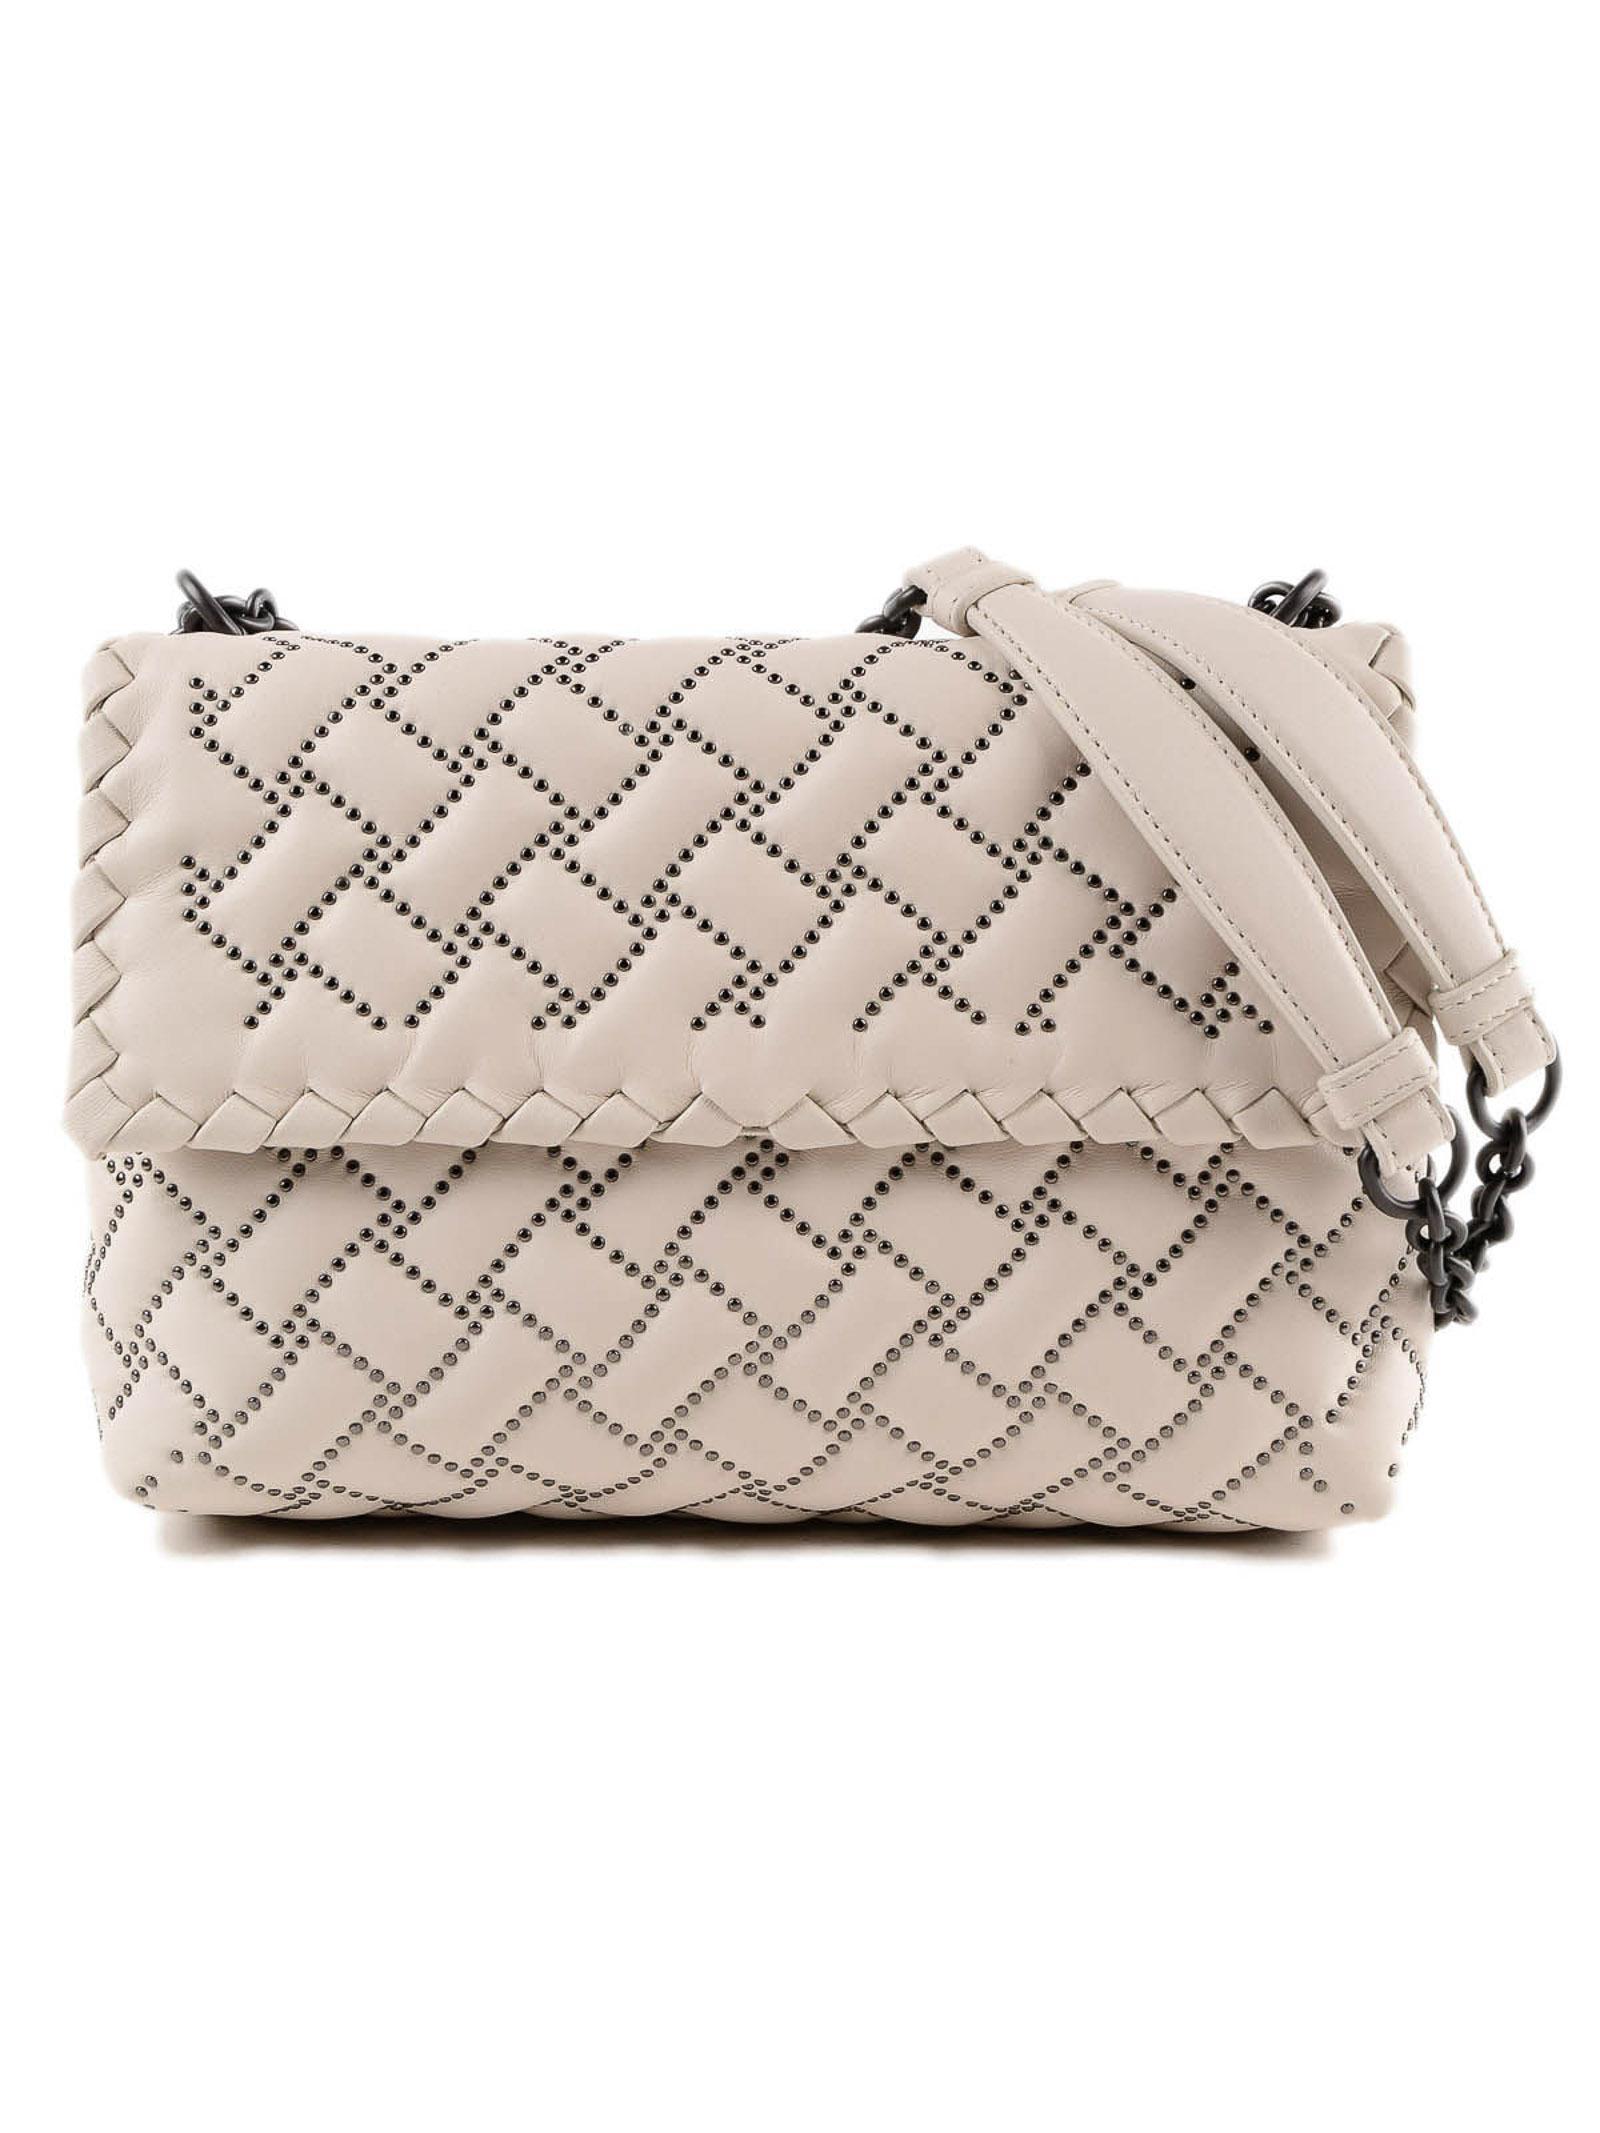 Bottega Veneta Sm Olimpia Bag in Natural - Lyst 0bbb579343edf